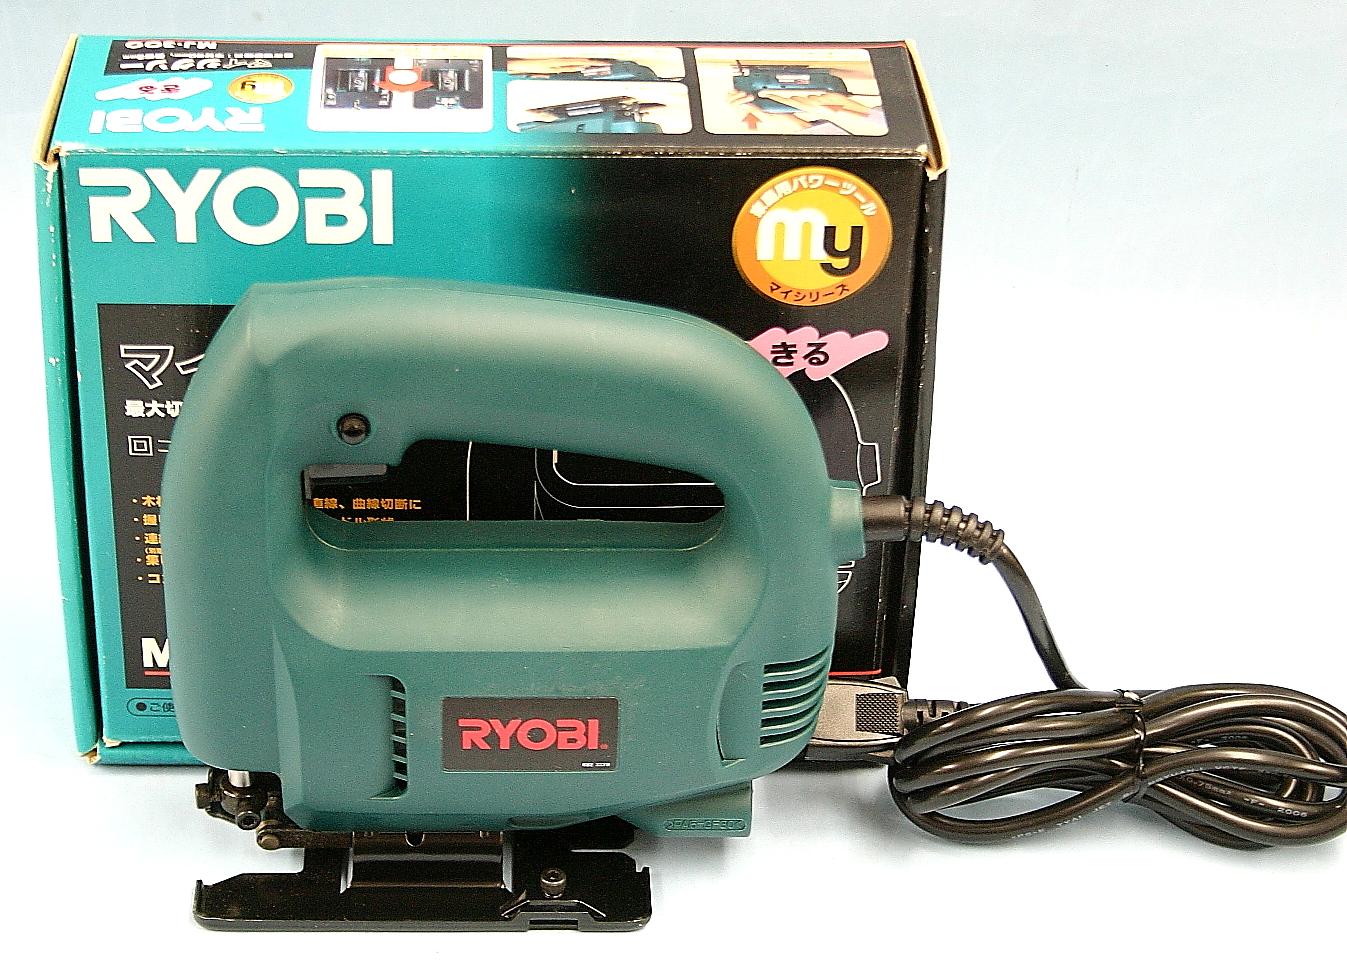 RYOBI ジグソー MJ-300